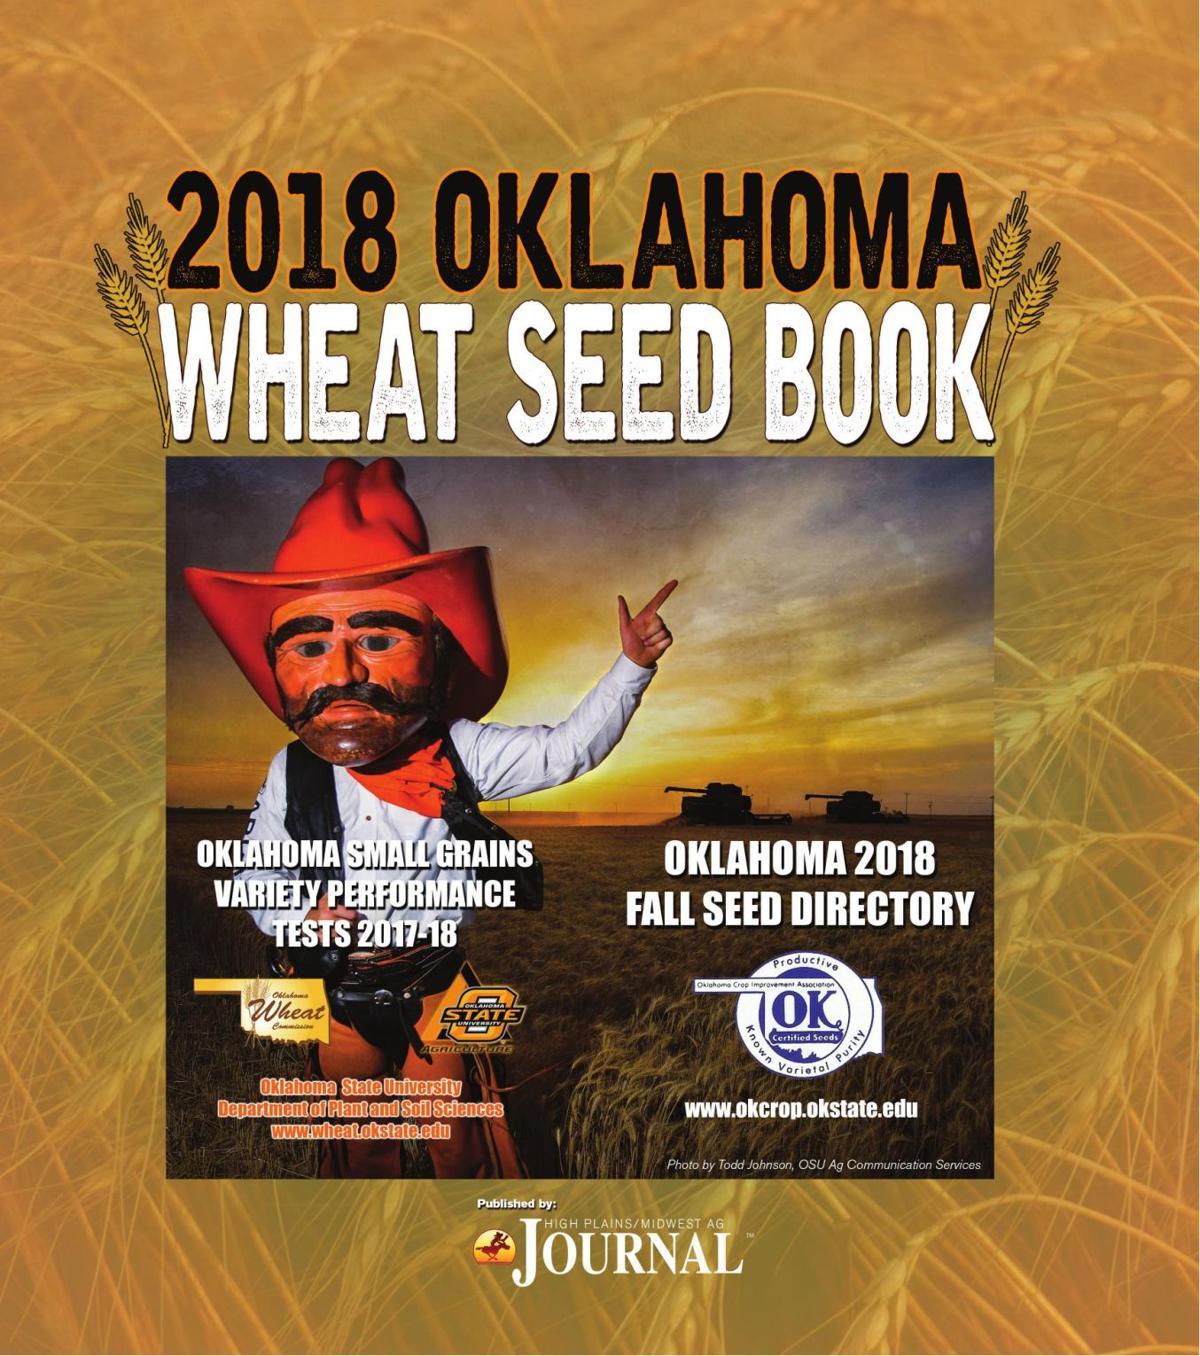 2018 Oklahoma Wheat Seed Book